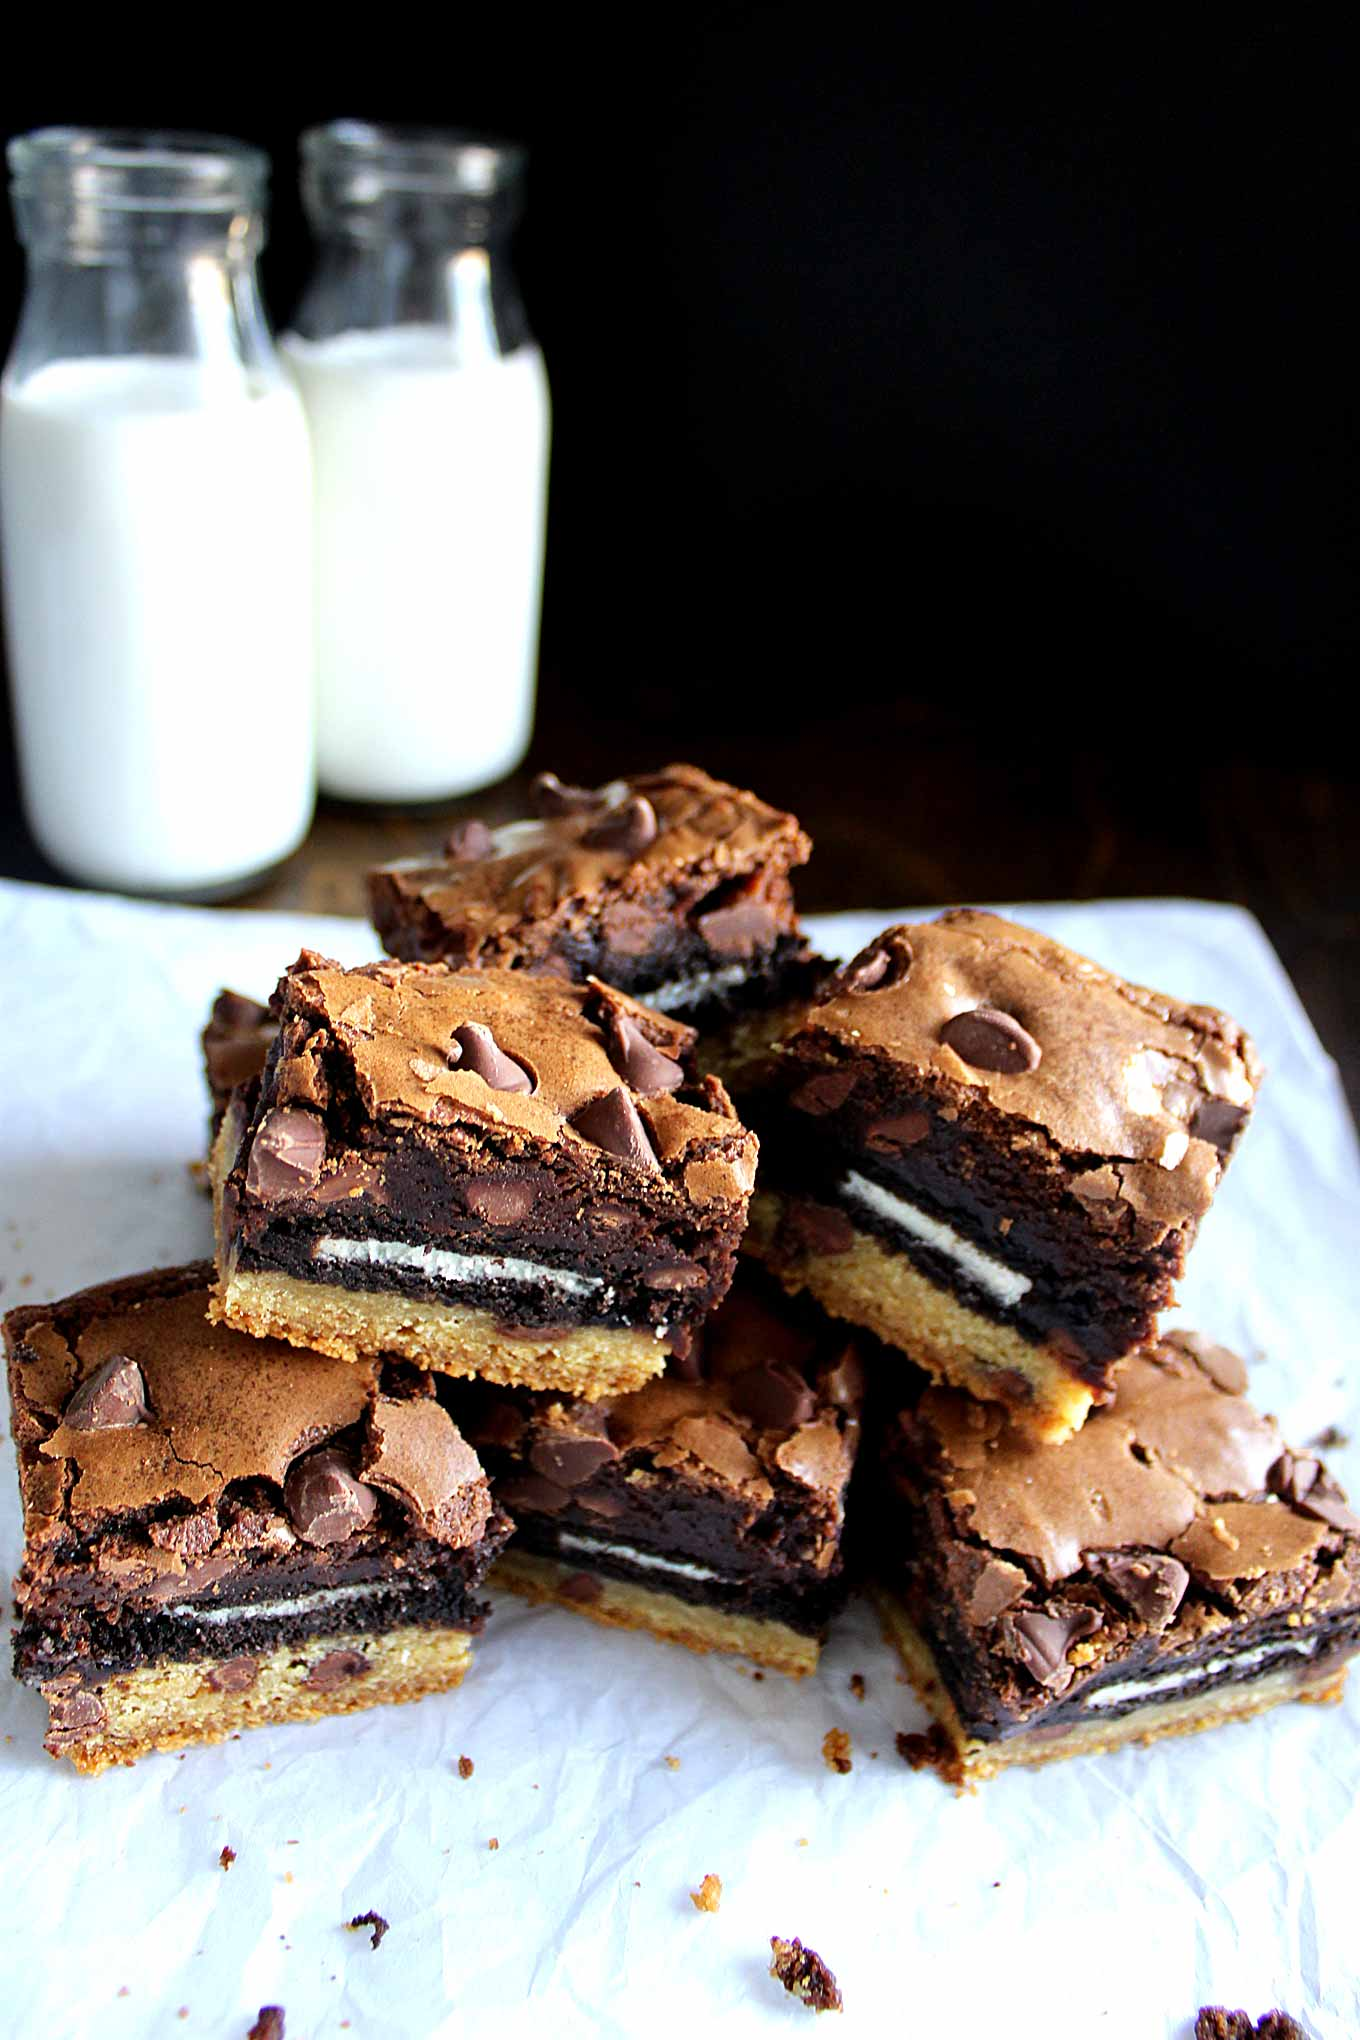 A Recipe To Make Chocolate Brownies